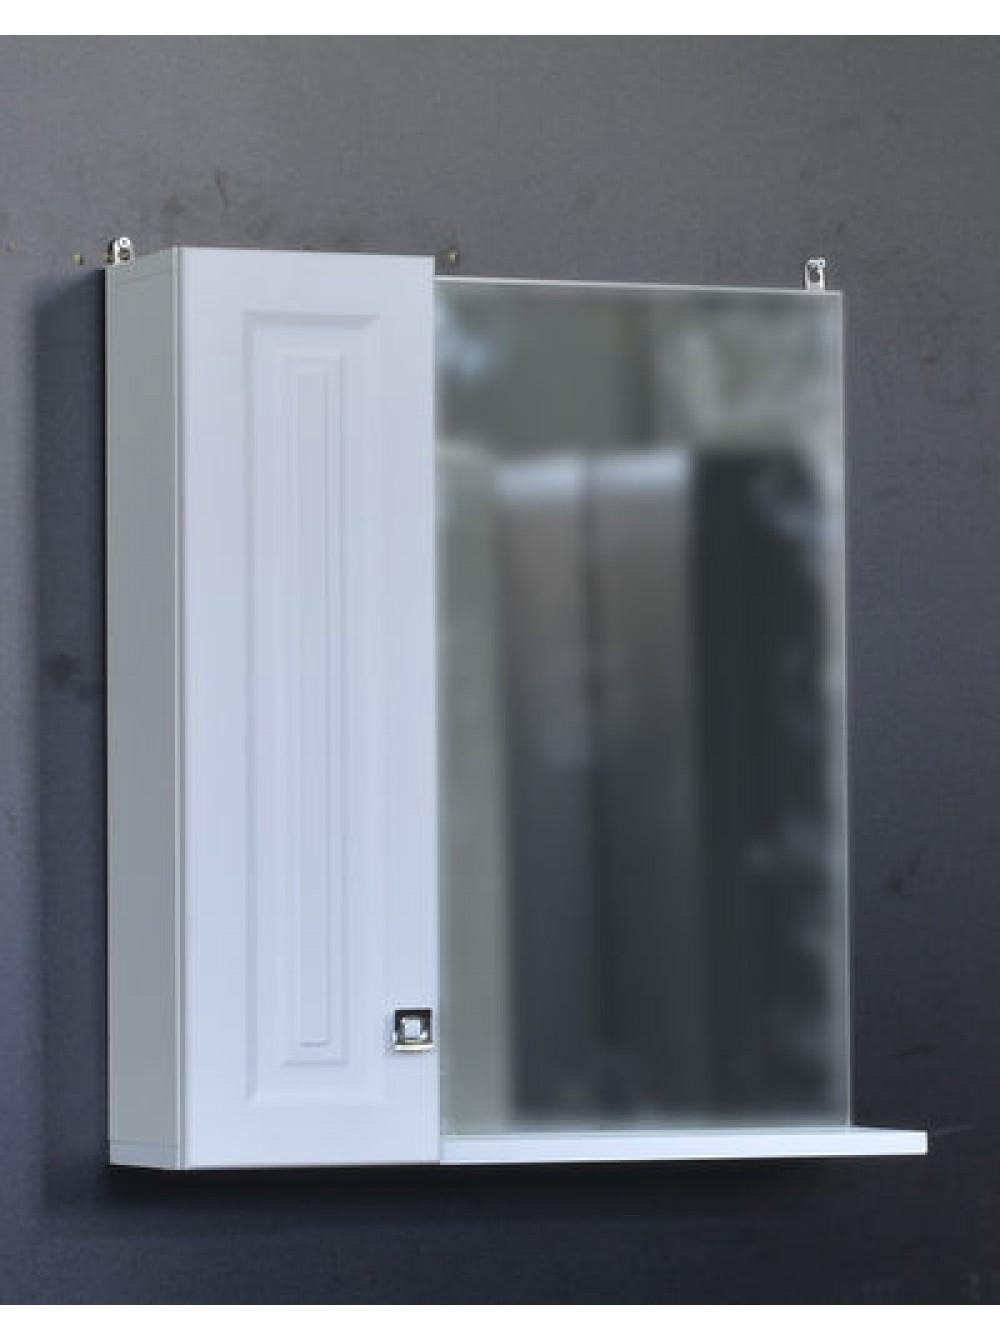 Зеркало-шкаф Клео-60 Белый софт 600*670*170мм СТК